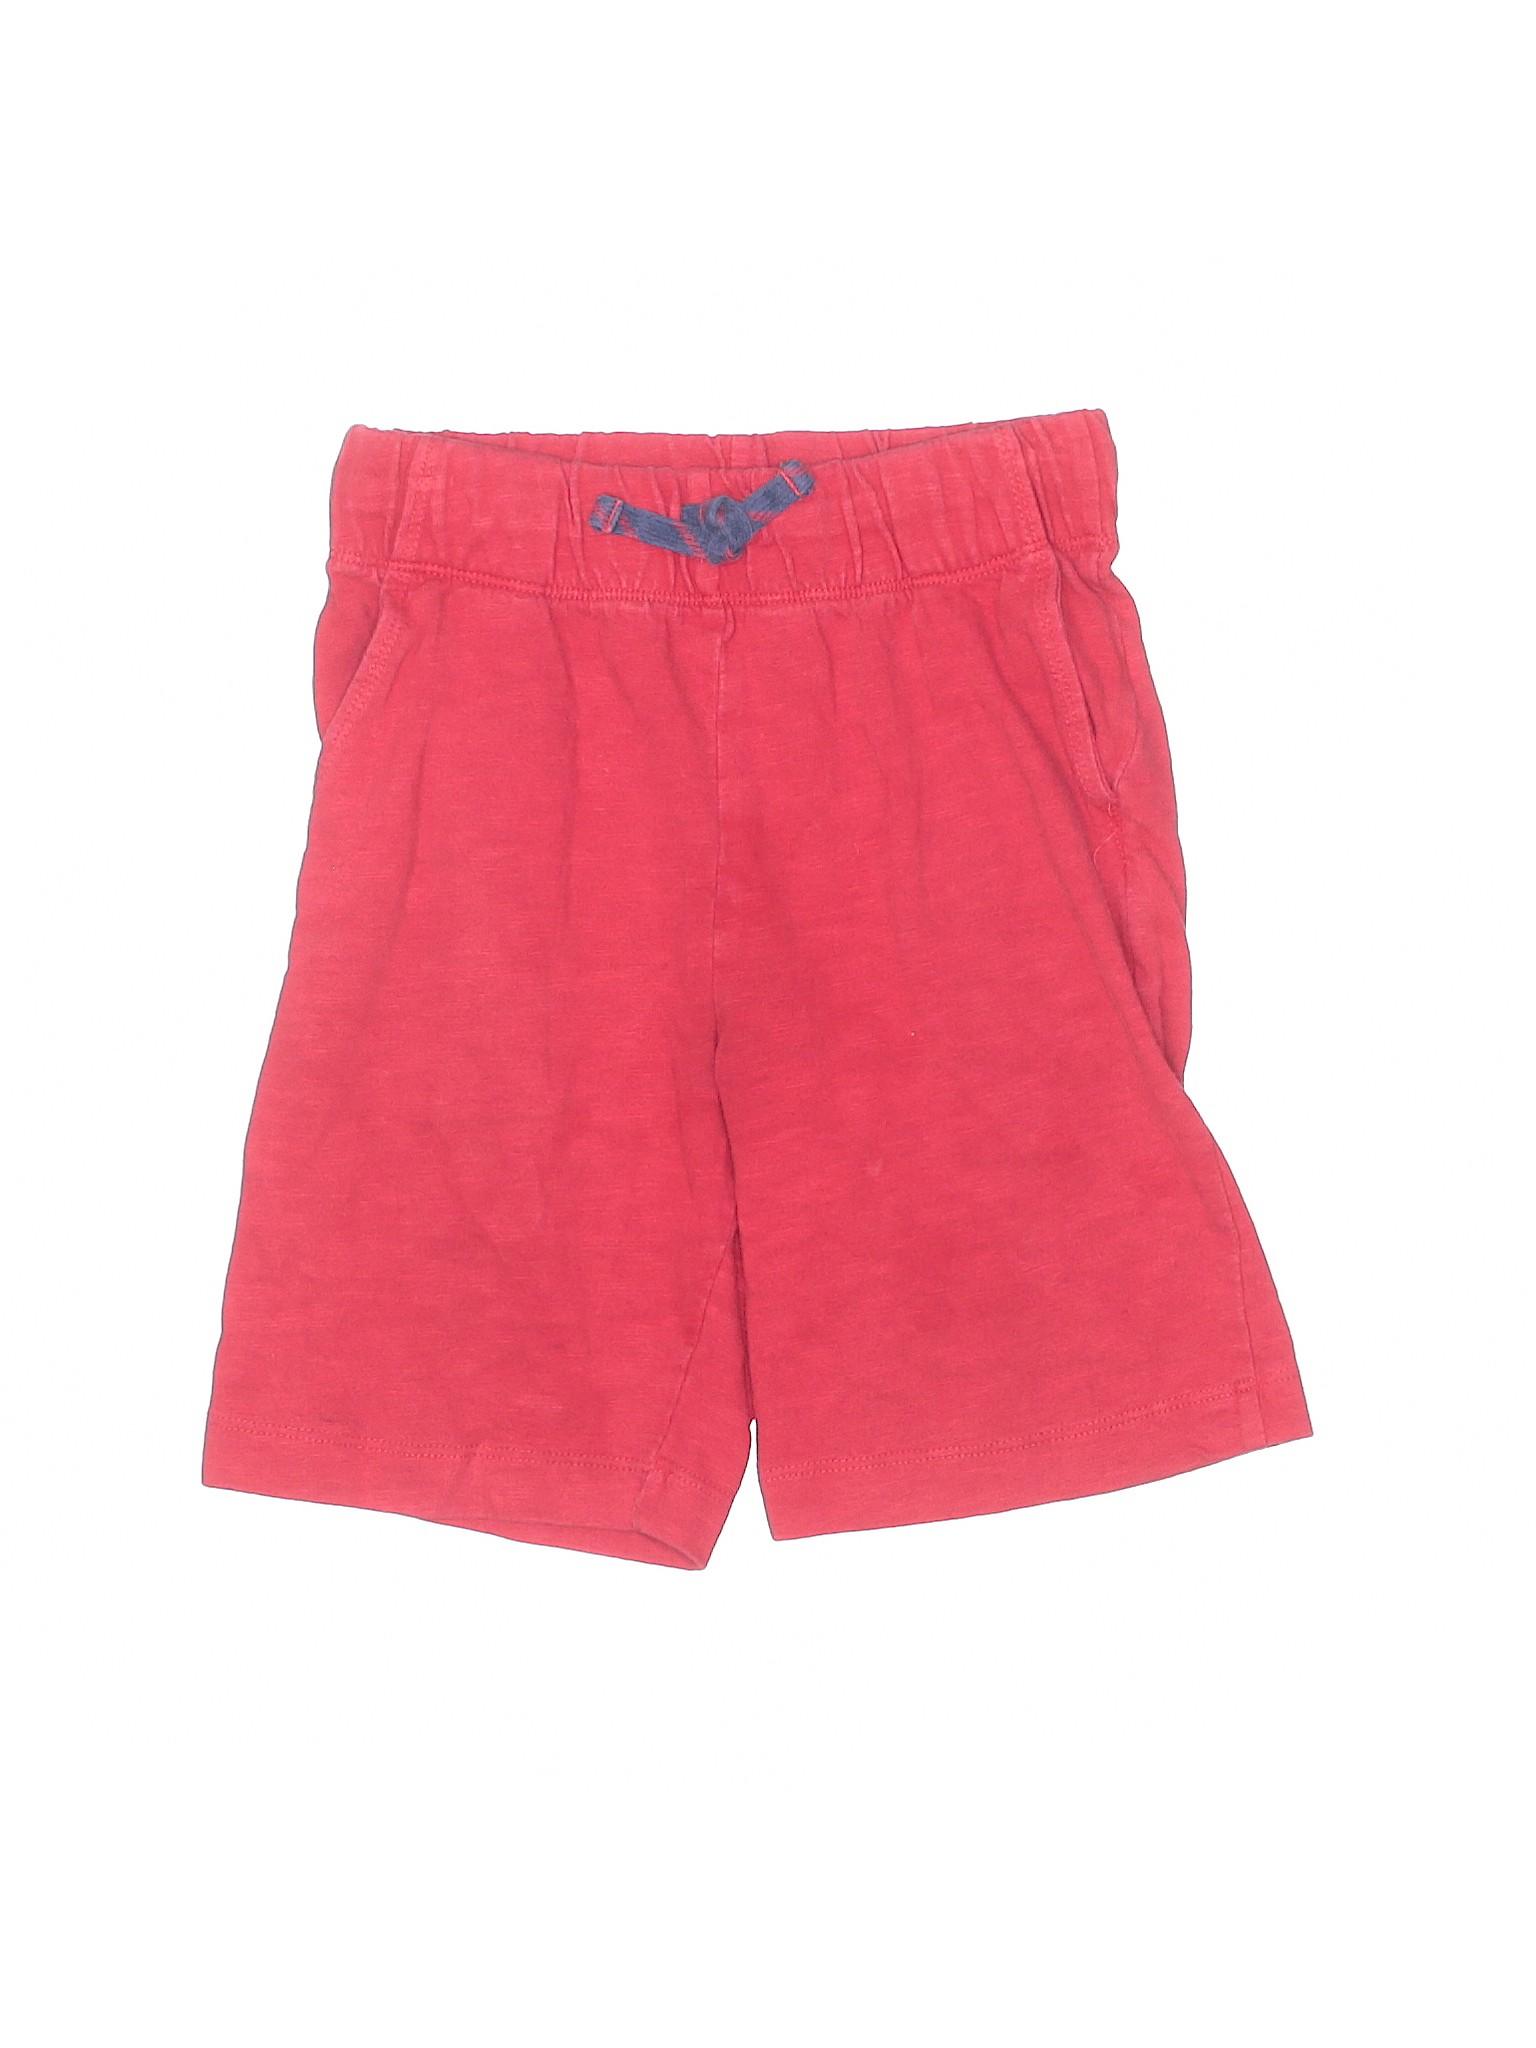 Miles Baby Boys Check Shorts Sizes 6M-4